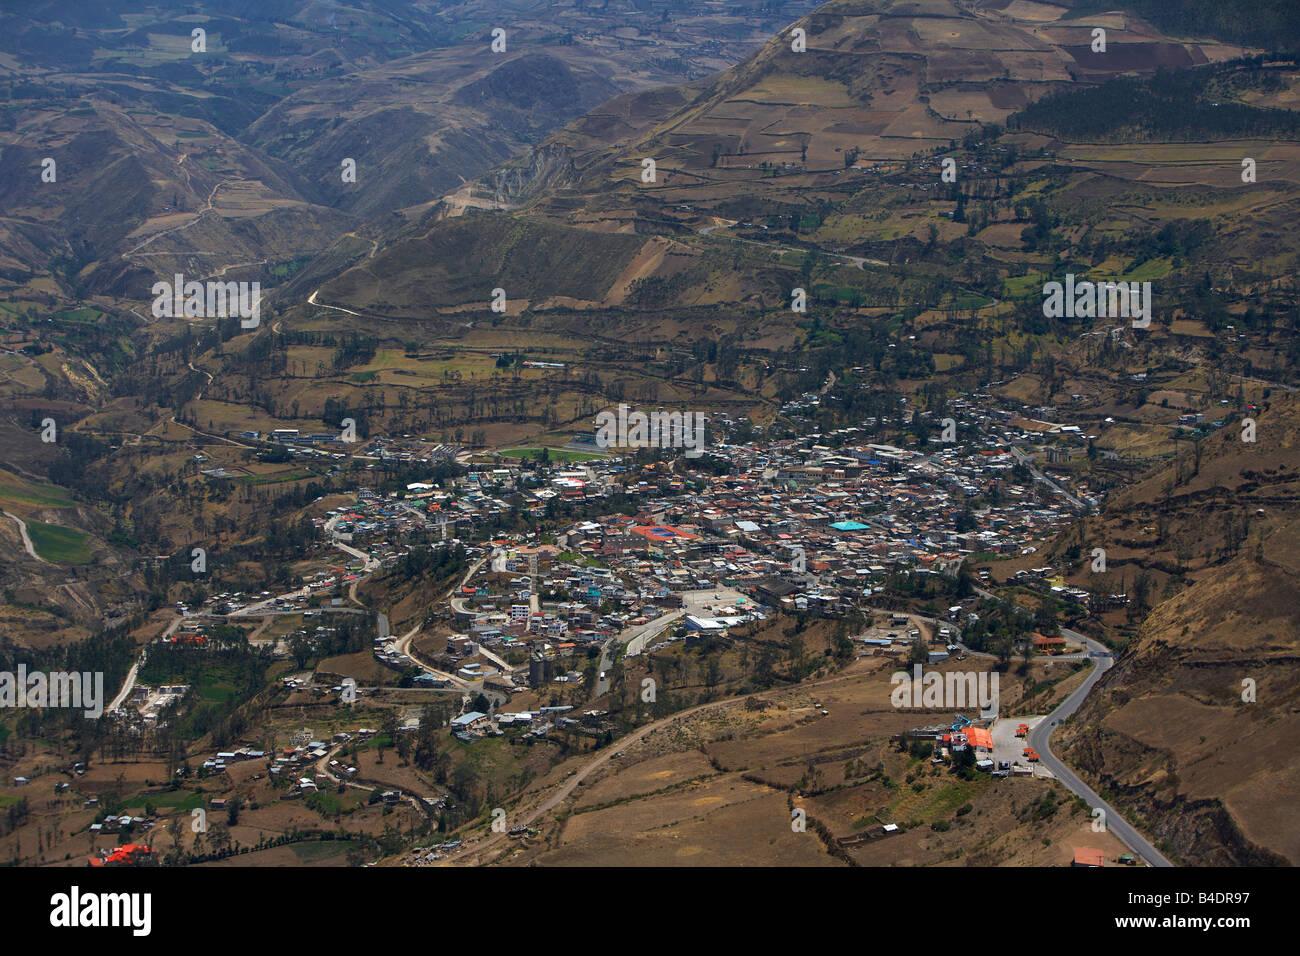 Mountain village, Alausi, Ecuador - Stock Image